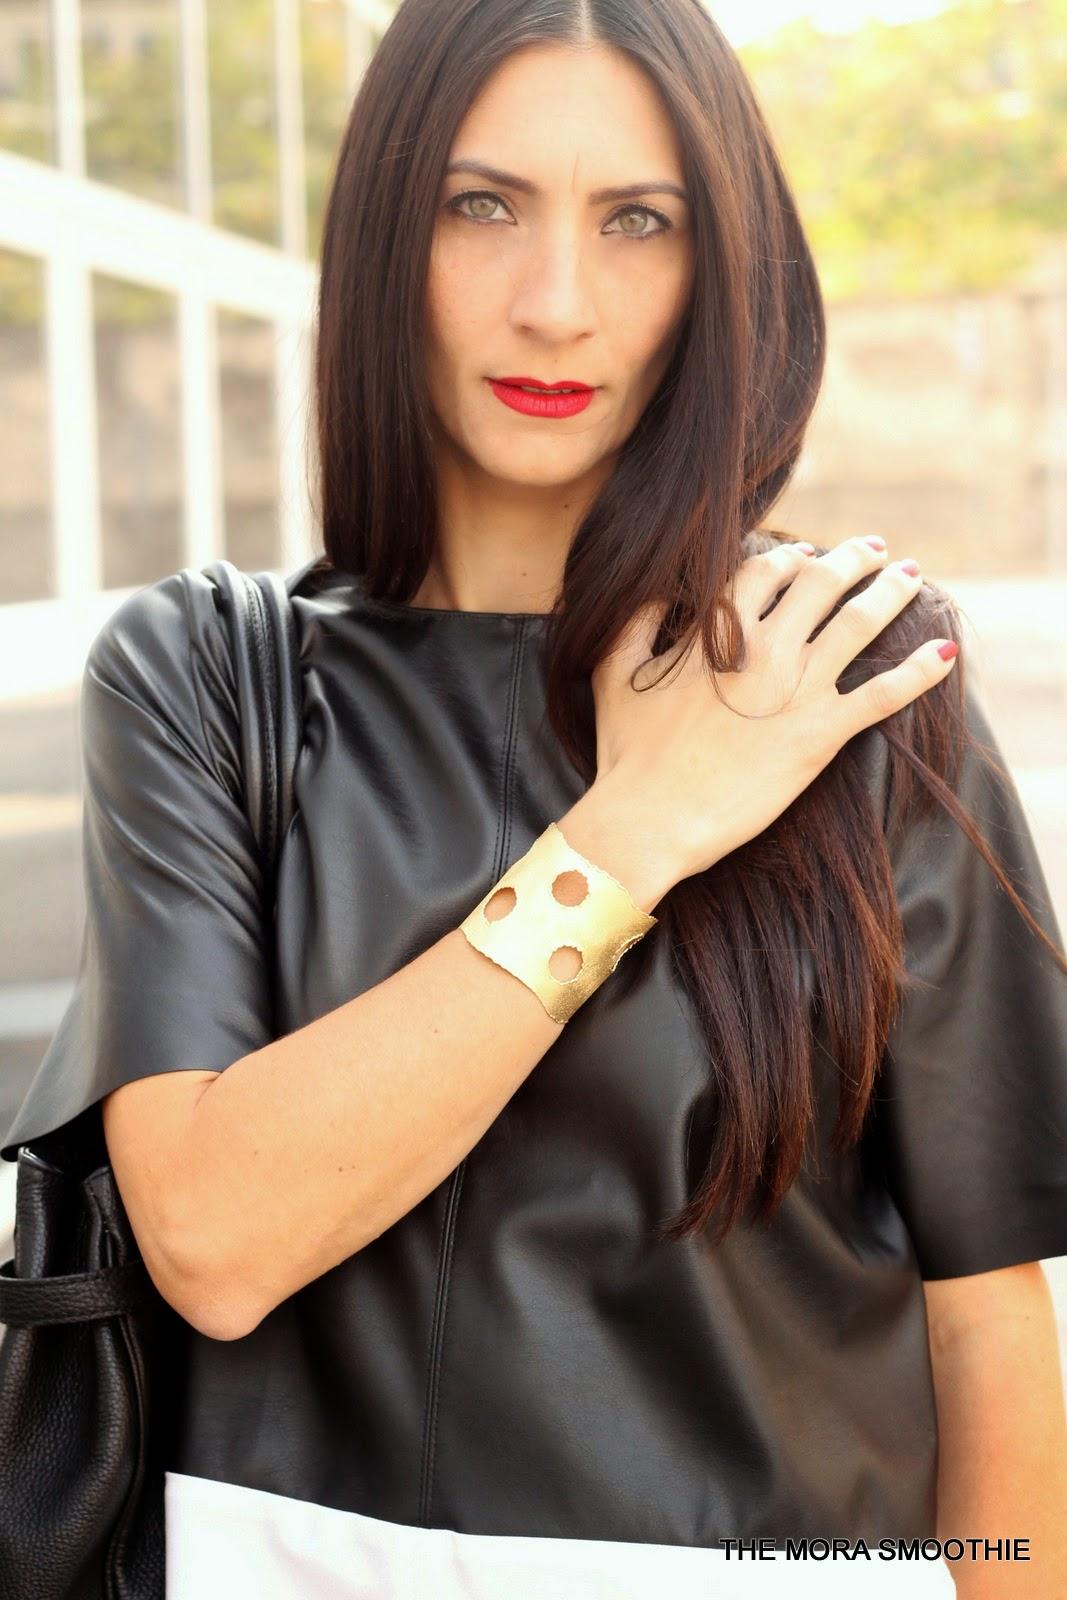 themorasmoothie, athena, athenagioielli, fashion, fashionblog, fashionblogger, italianfashionblog, primark, bracelet, outfit, look, italianblog, girl, shopping, shoppingonline, gioielli, jewellery, madeinitaly, blogger, ootd, look